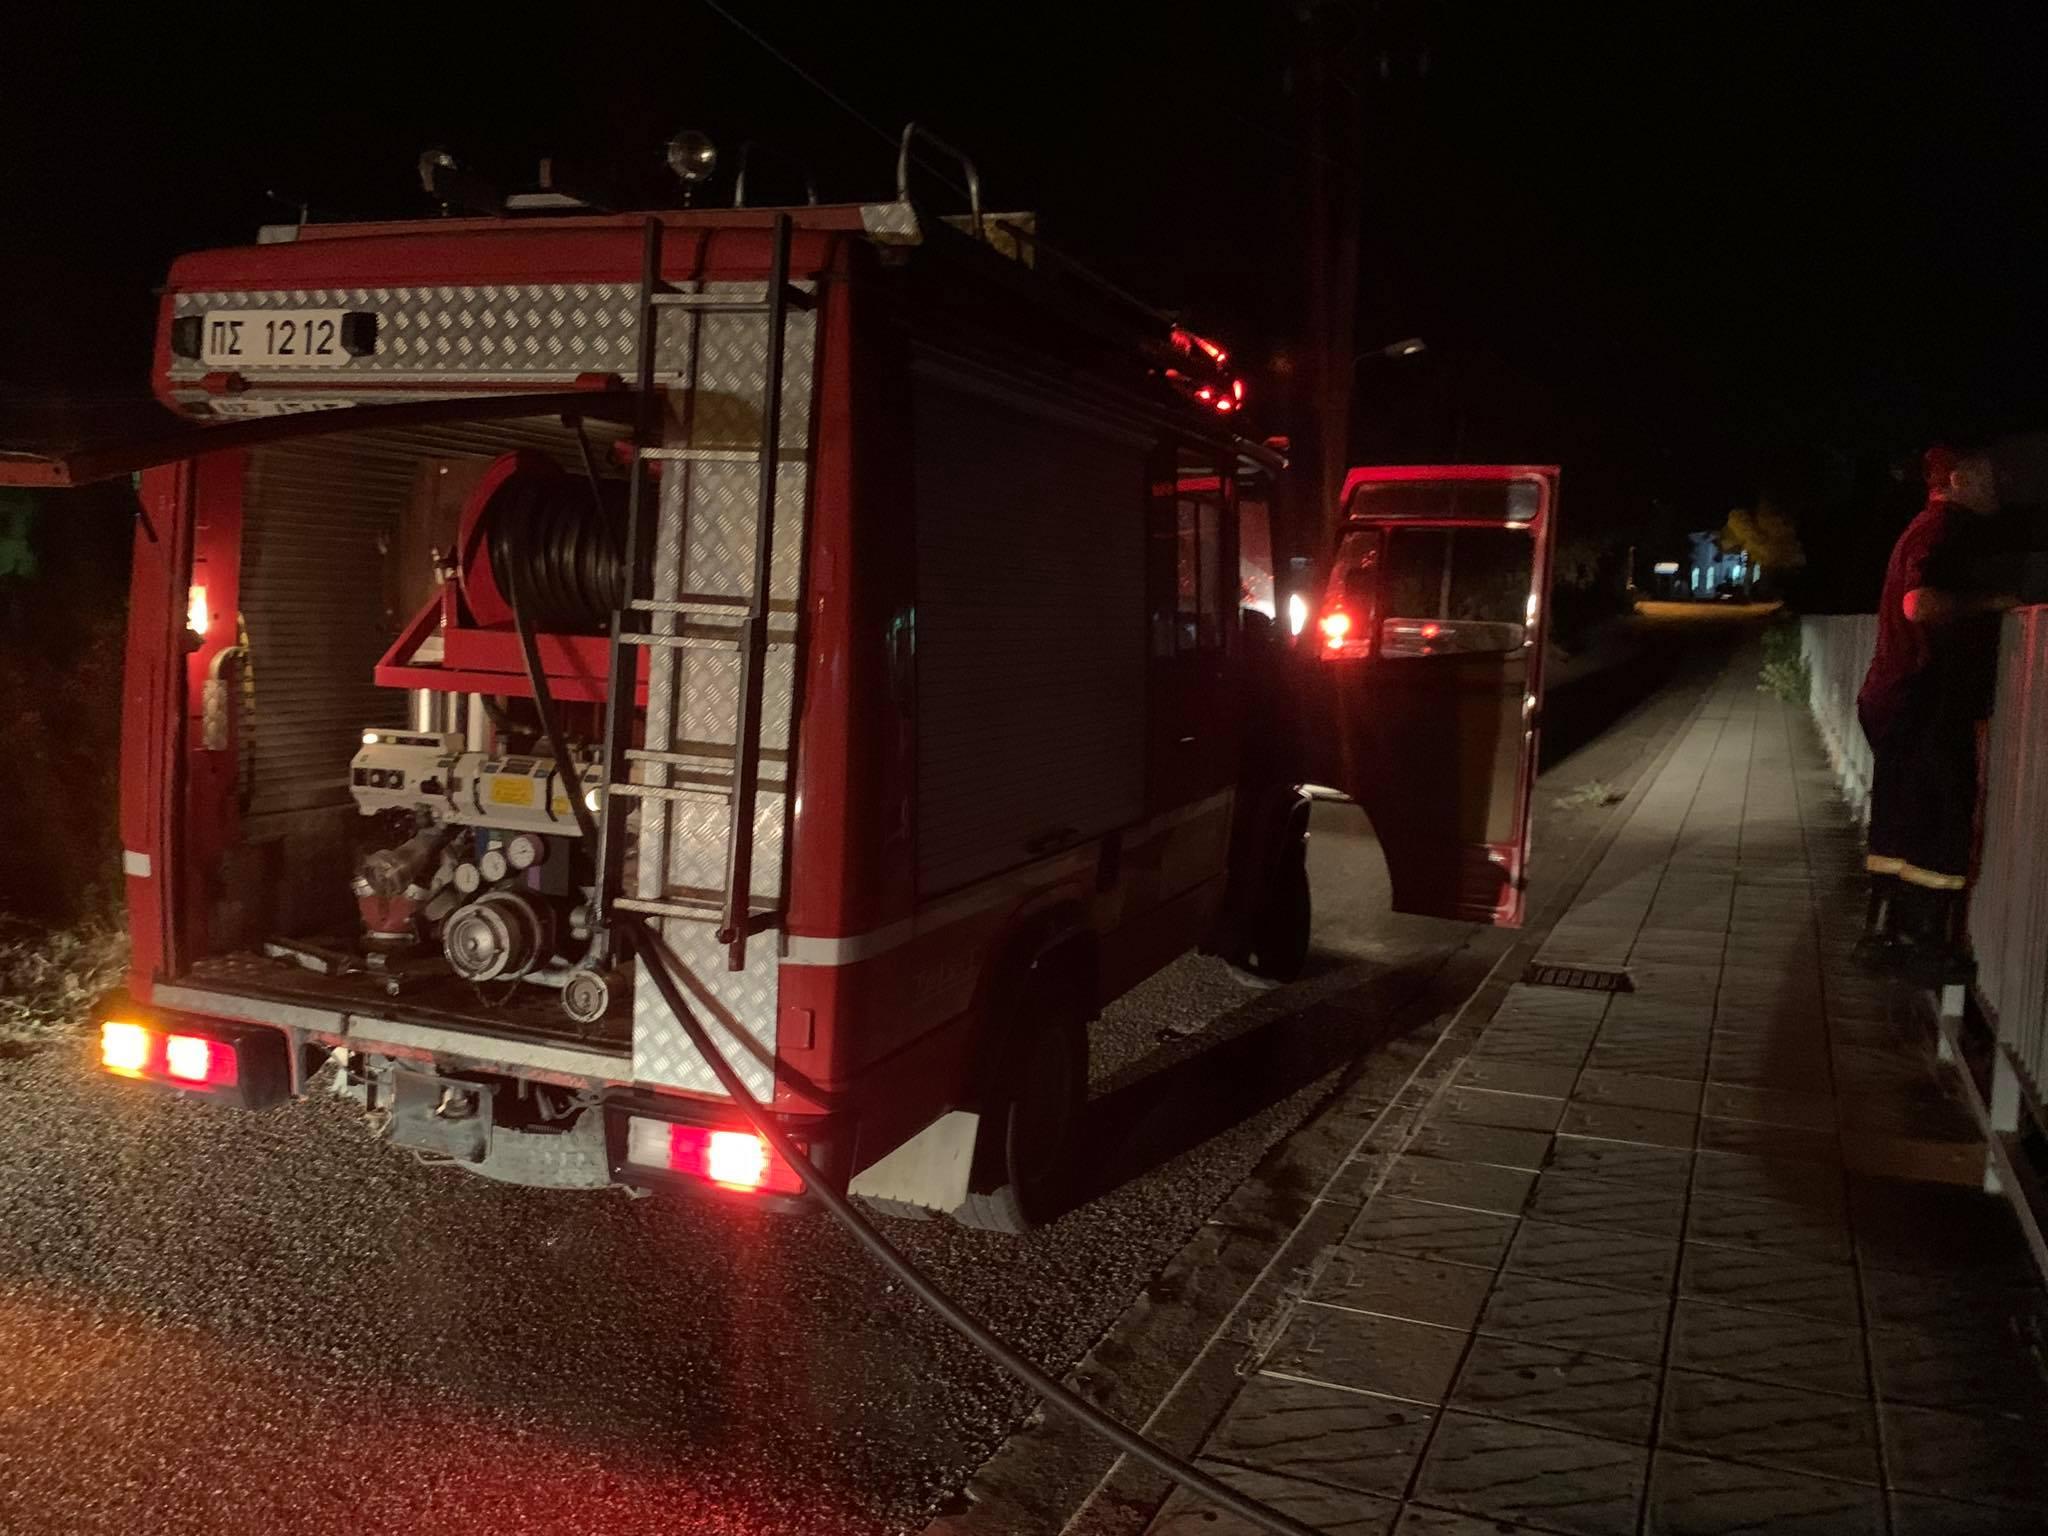 Aστακός: μεγάλες ζημιές απο πυρκαγιά σε μονοκατοικία